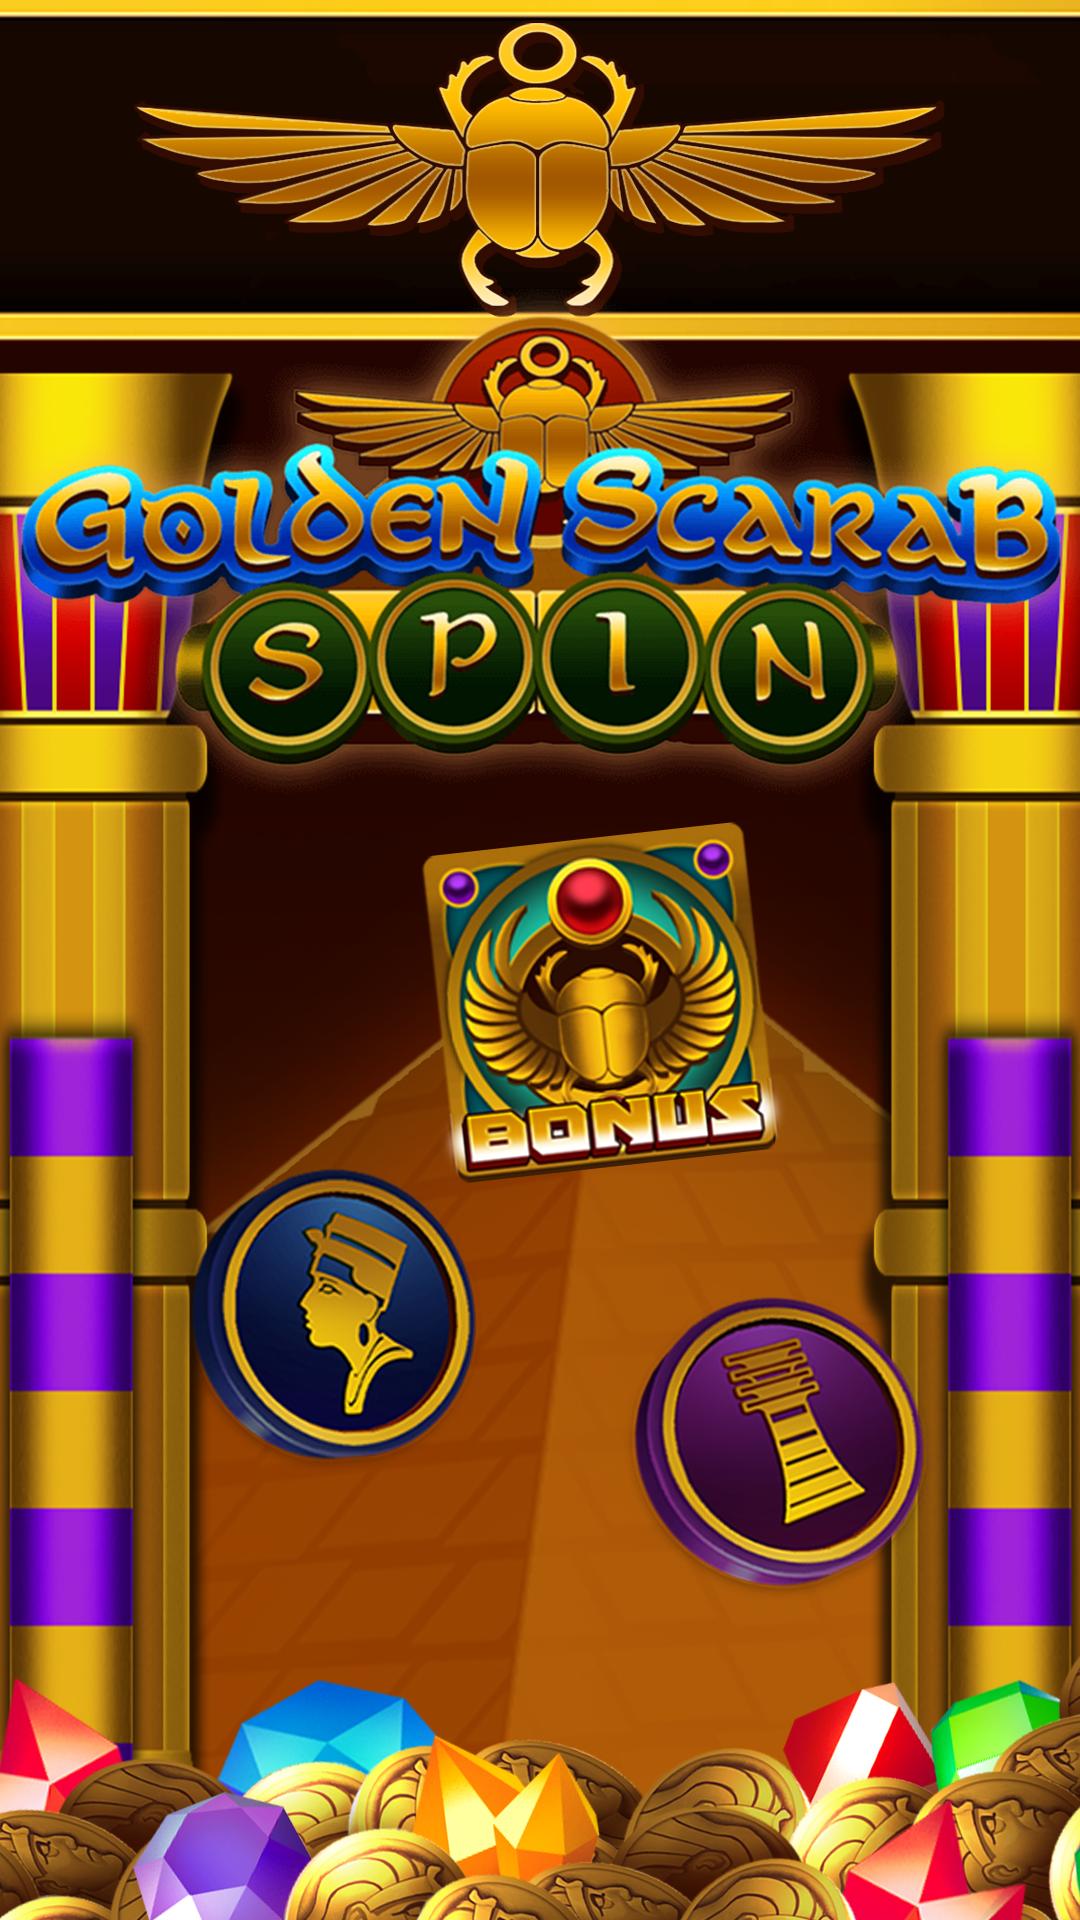 Casino games image by Wild Ruby Casino Casino, Casino